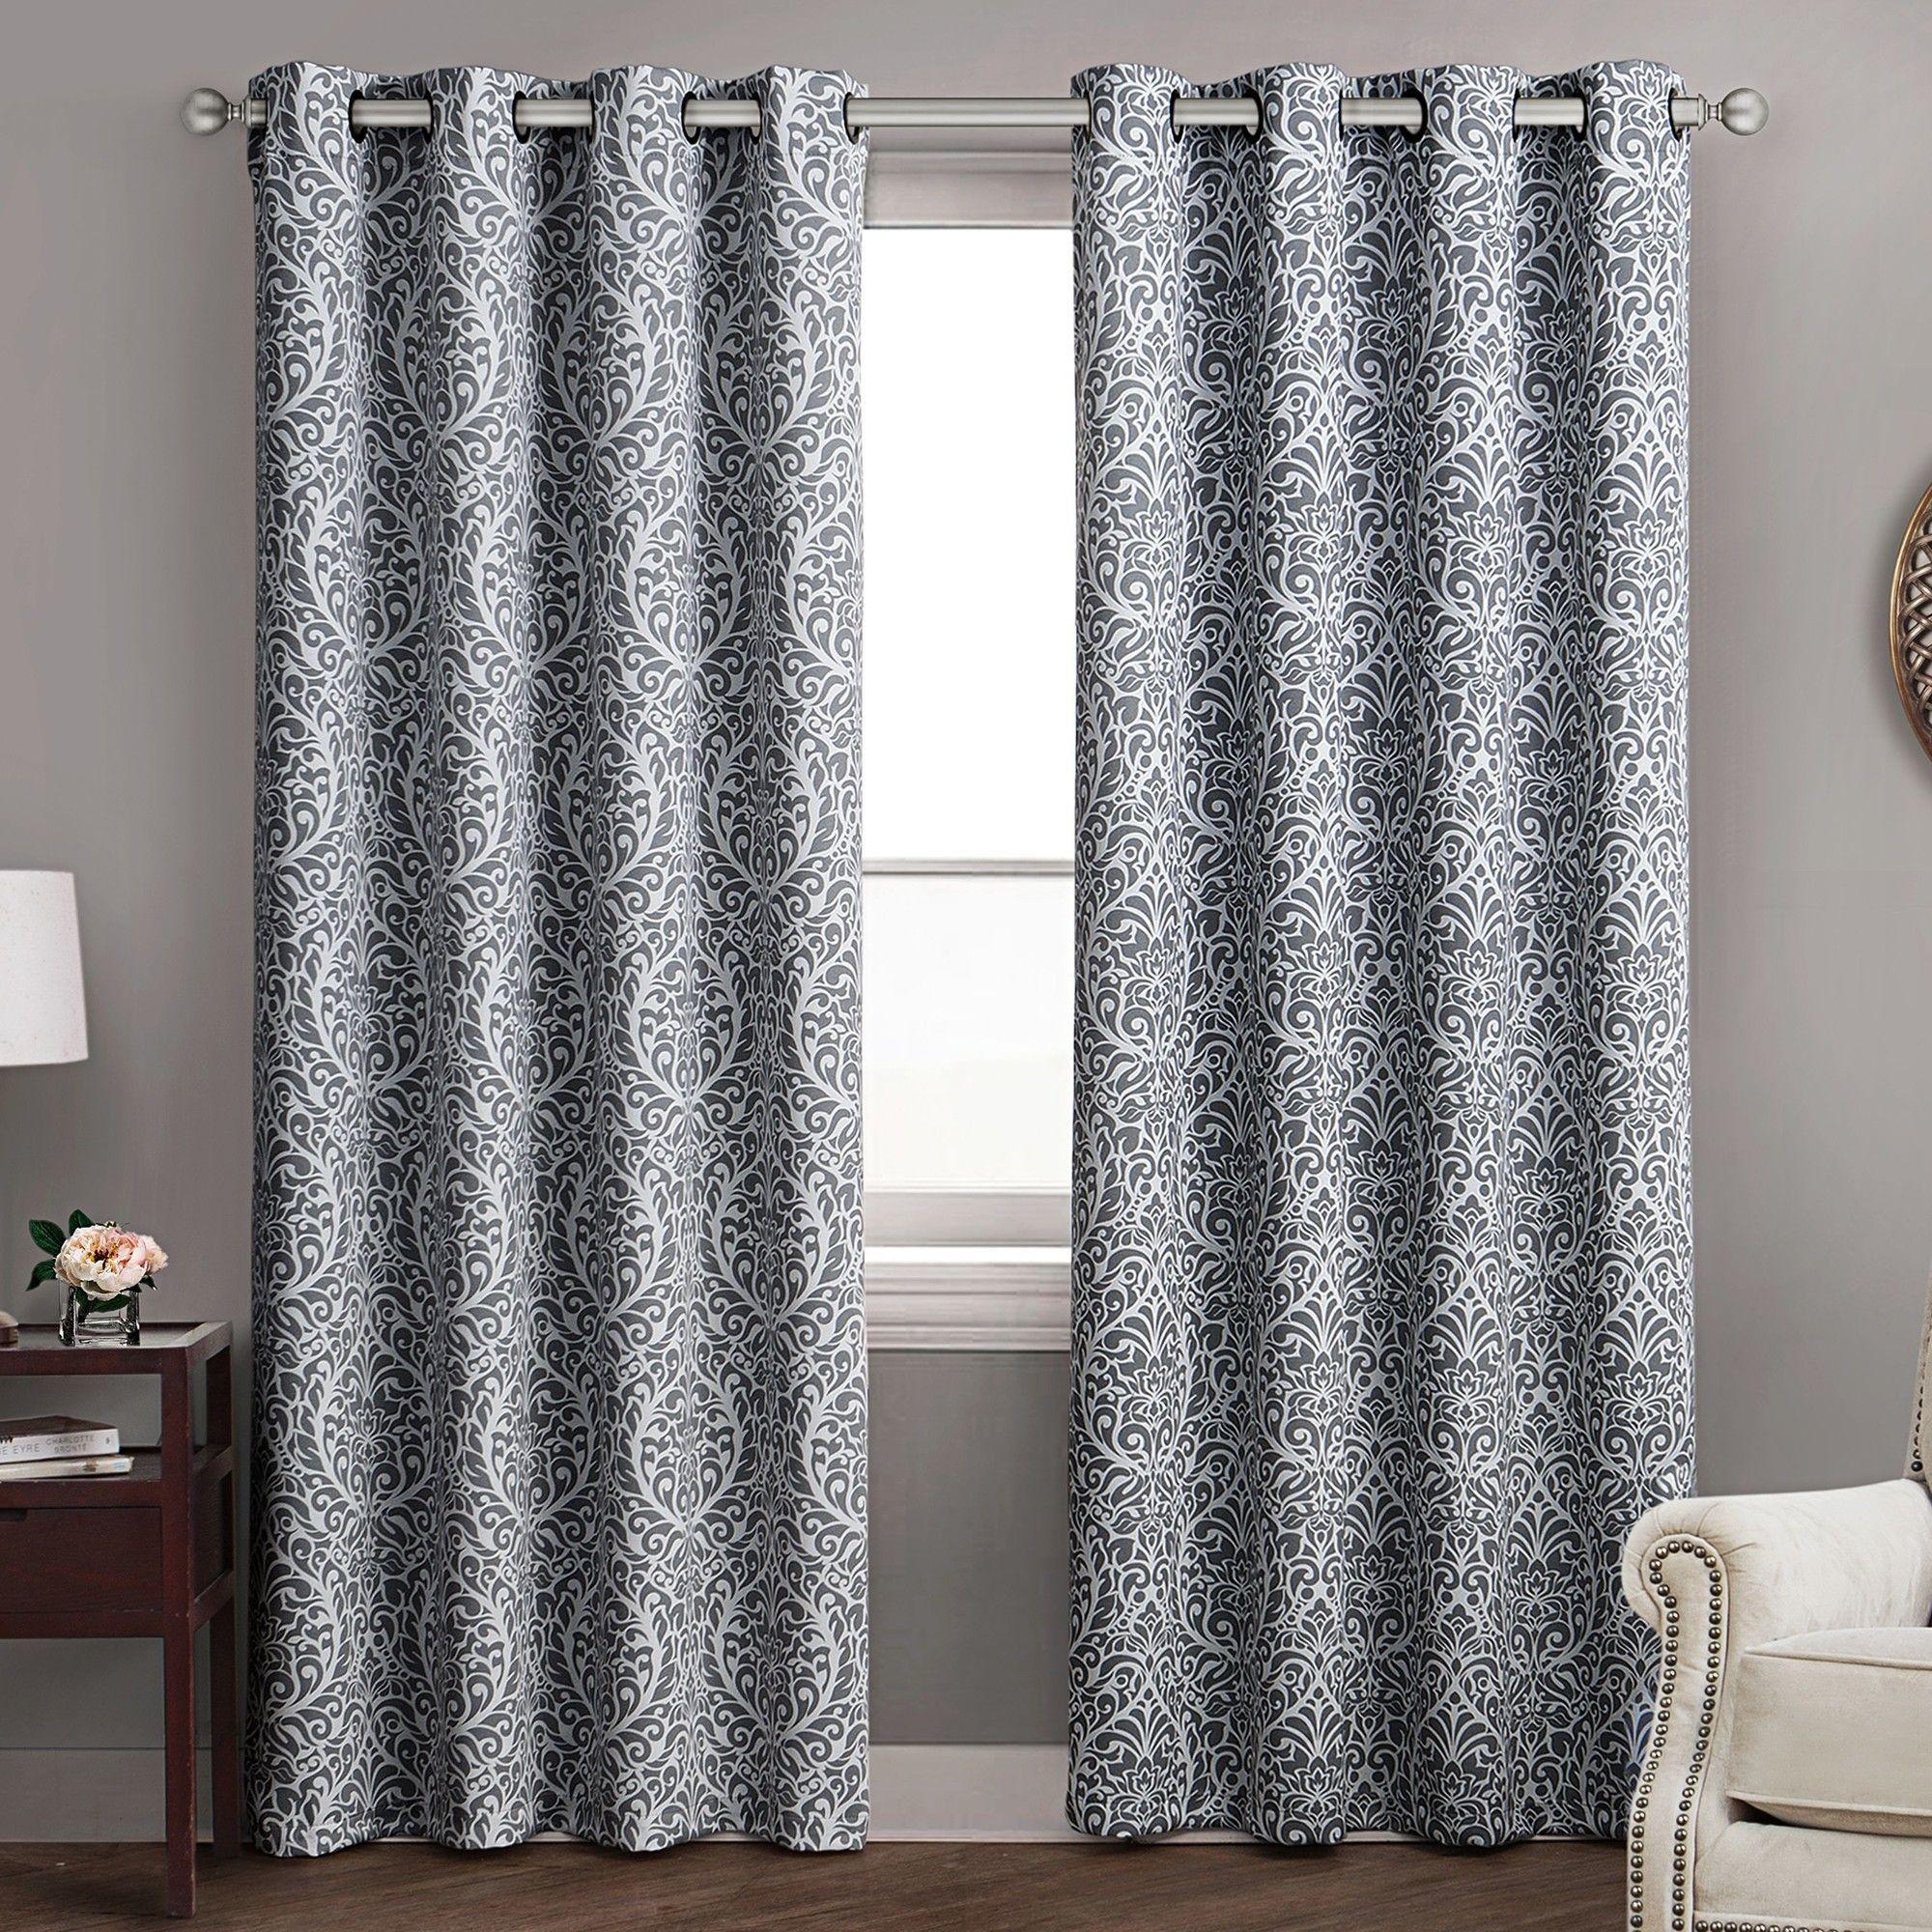 European window coverings  madera blackout curtain panels  best blackout curtains  pinterest